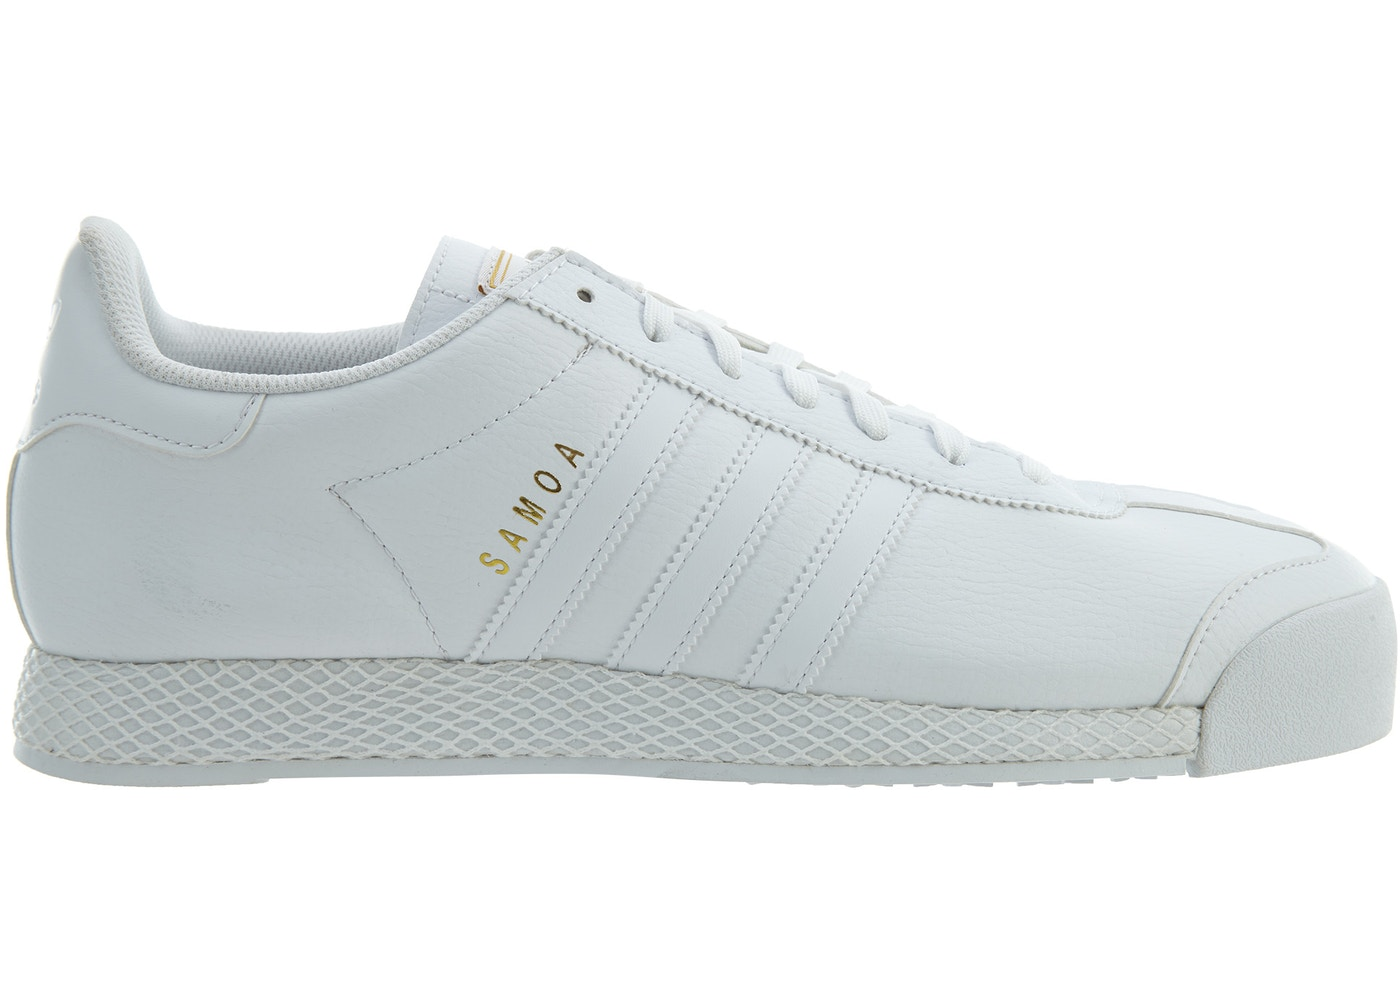 e4be7c1ad4 adidas Samoa White White-Gold Metallic - F37599